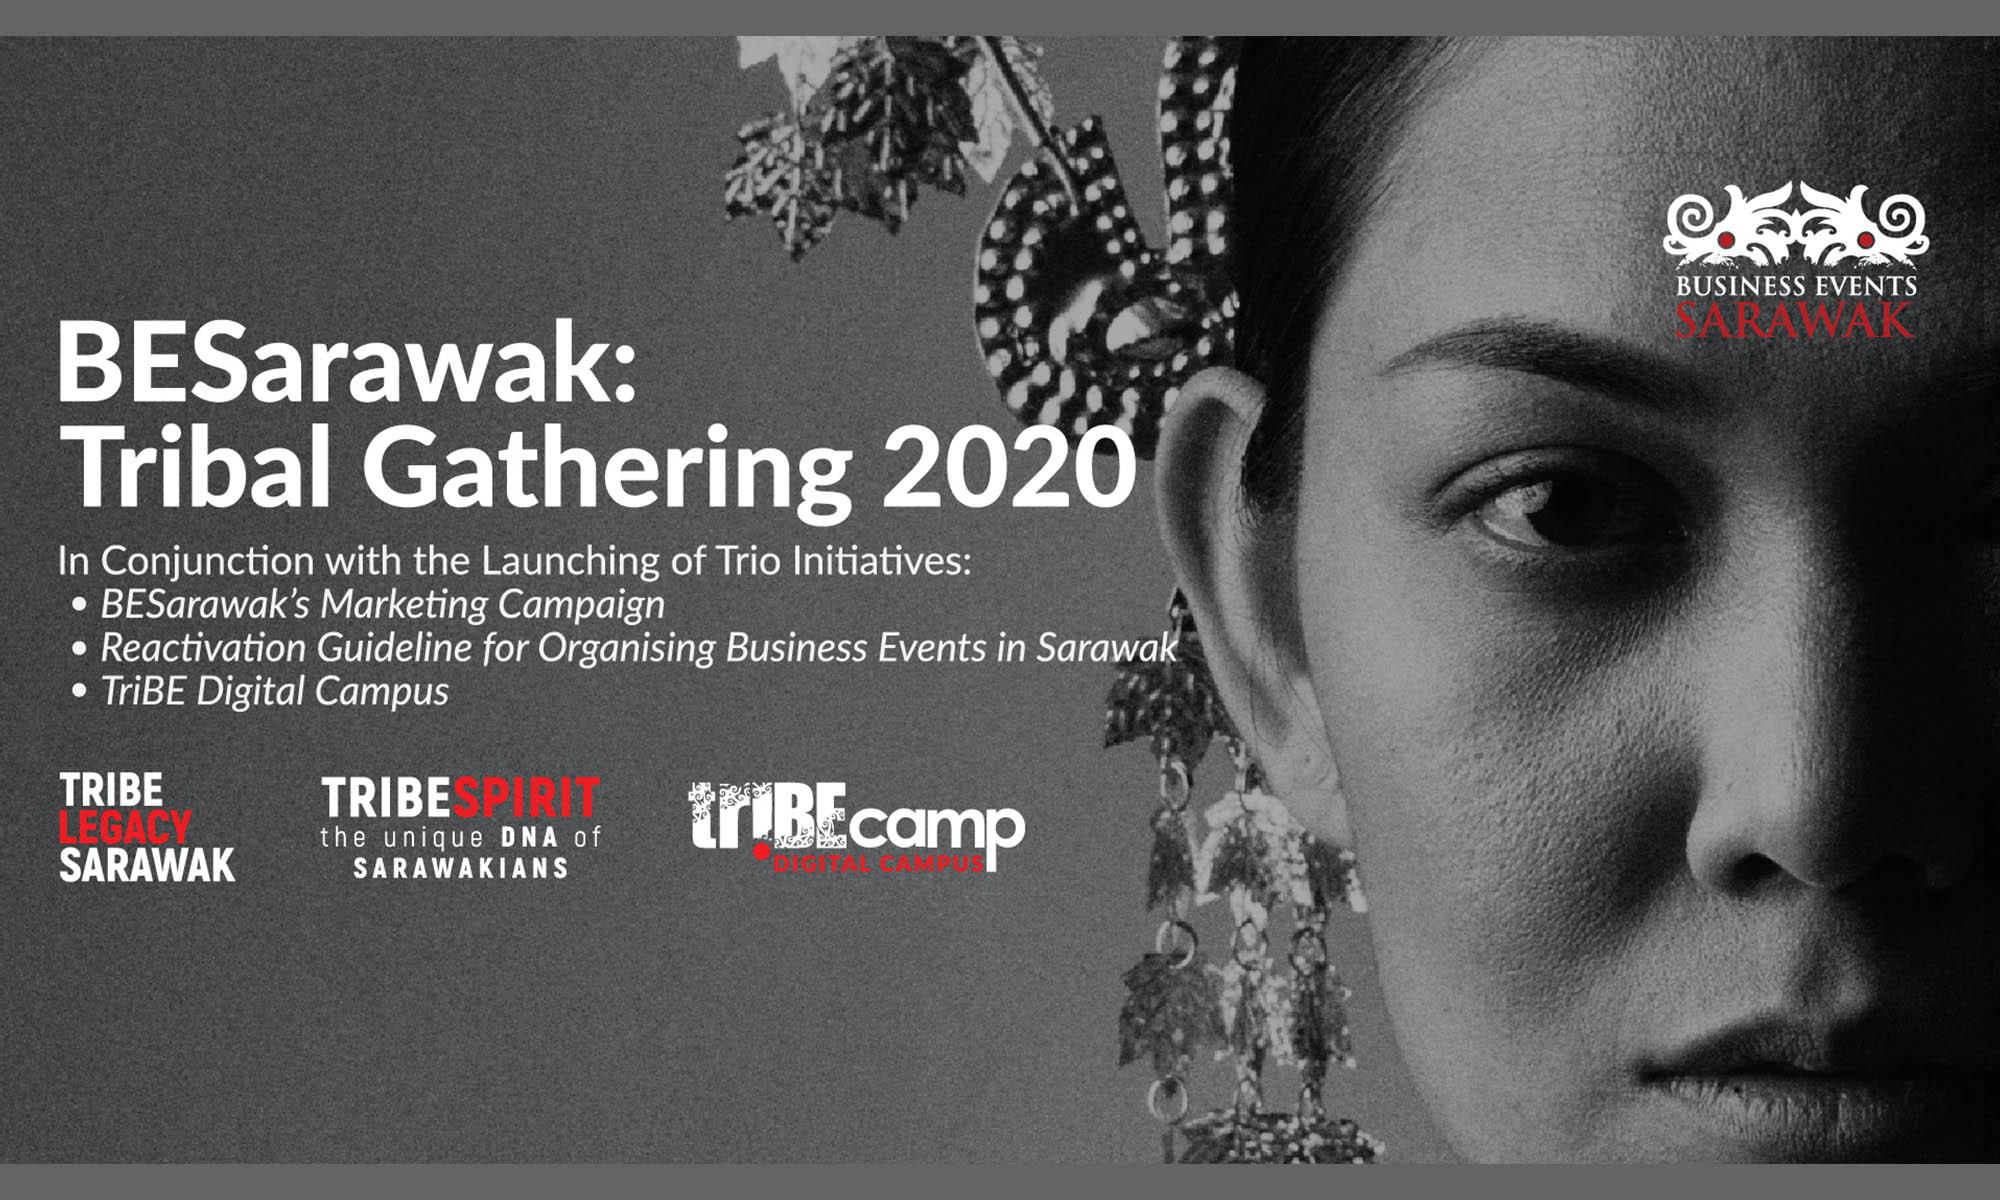 BESarawak launches 'TRIBE LEGACY SARAWAK'